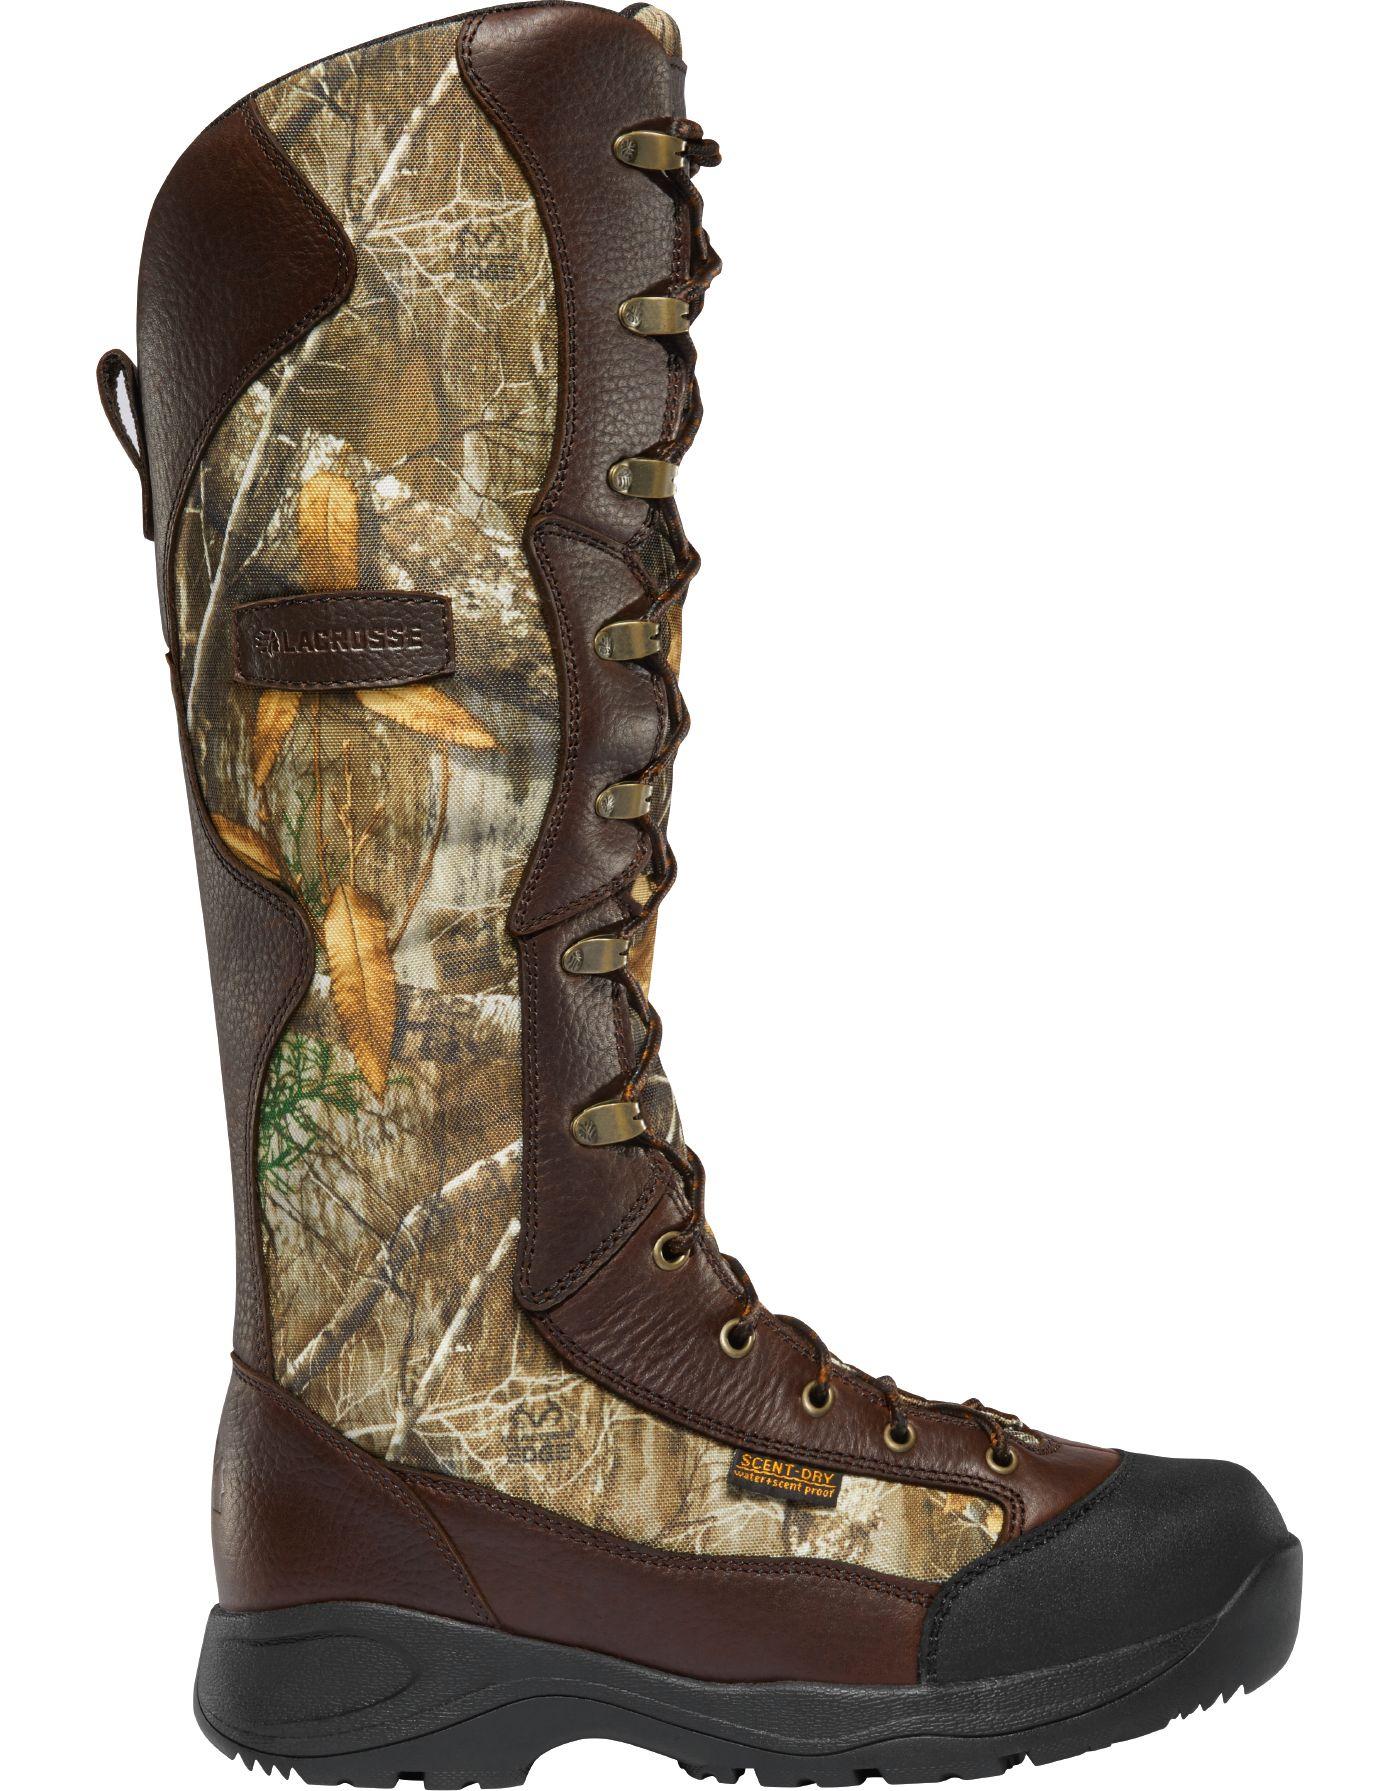 LaCrosse Men's Venom 18'' Realtree Edge Snakeproof Hunting Boots